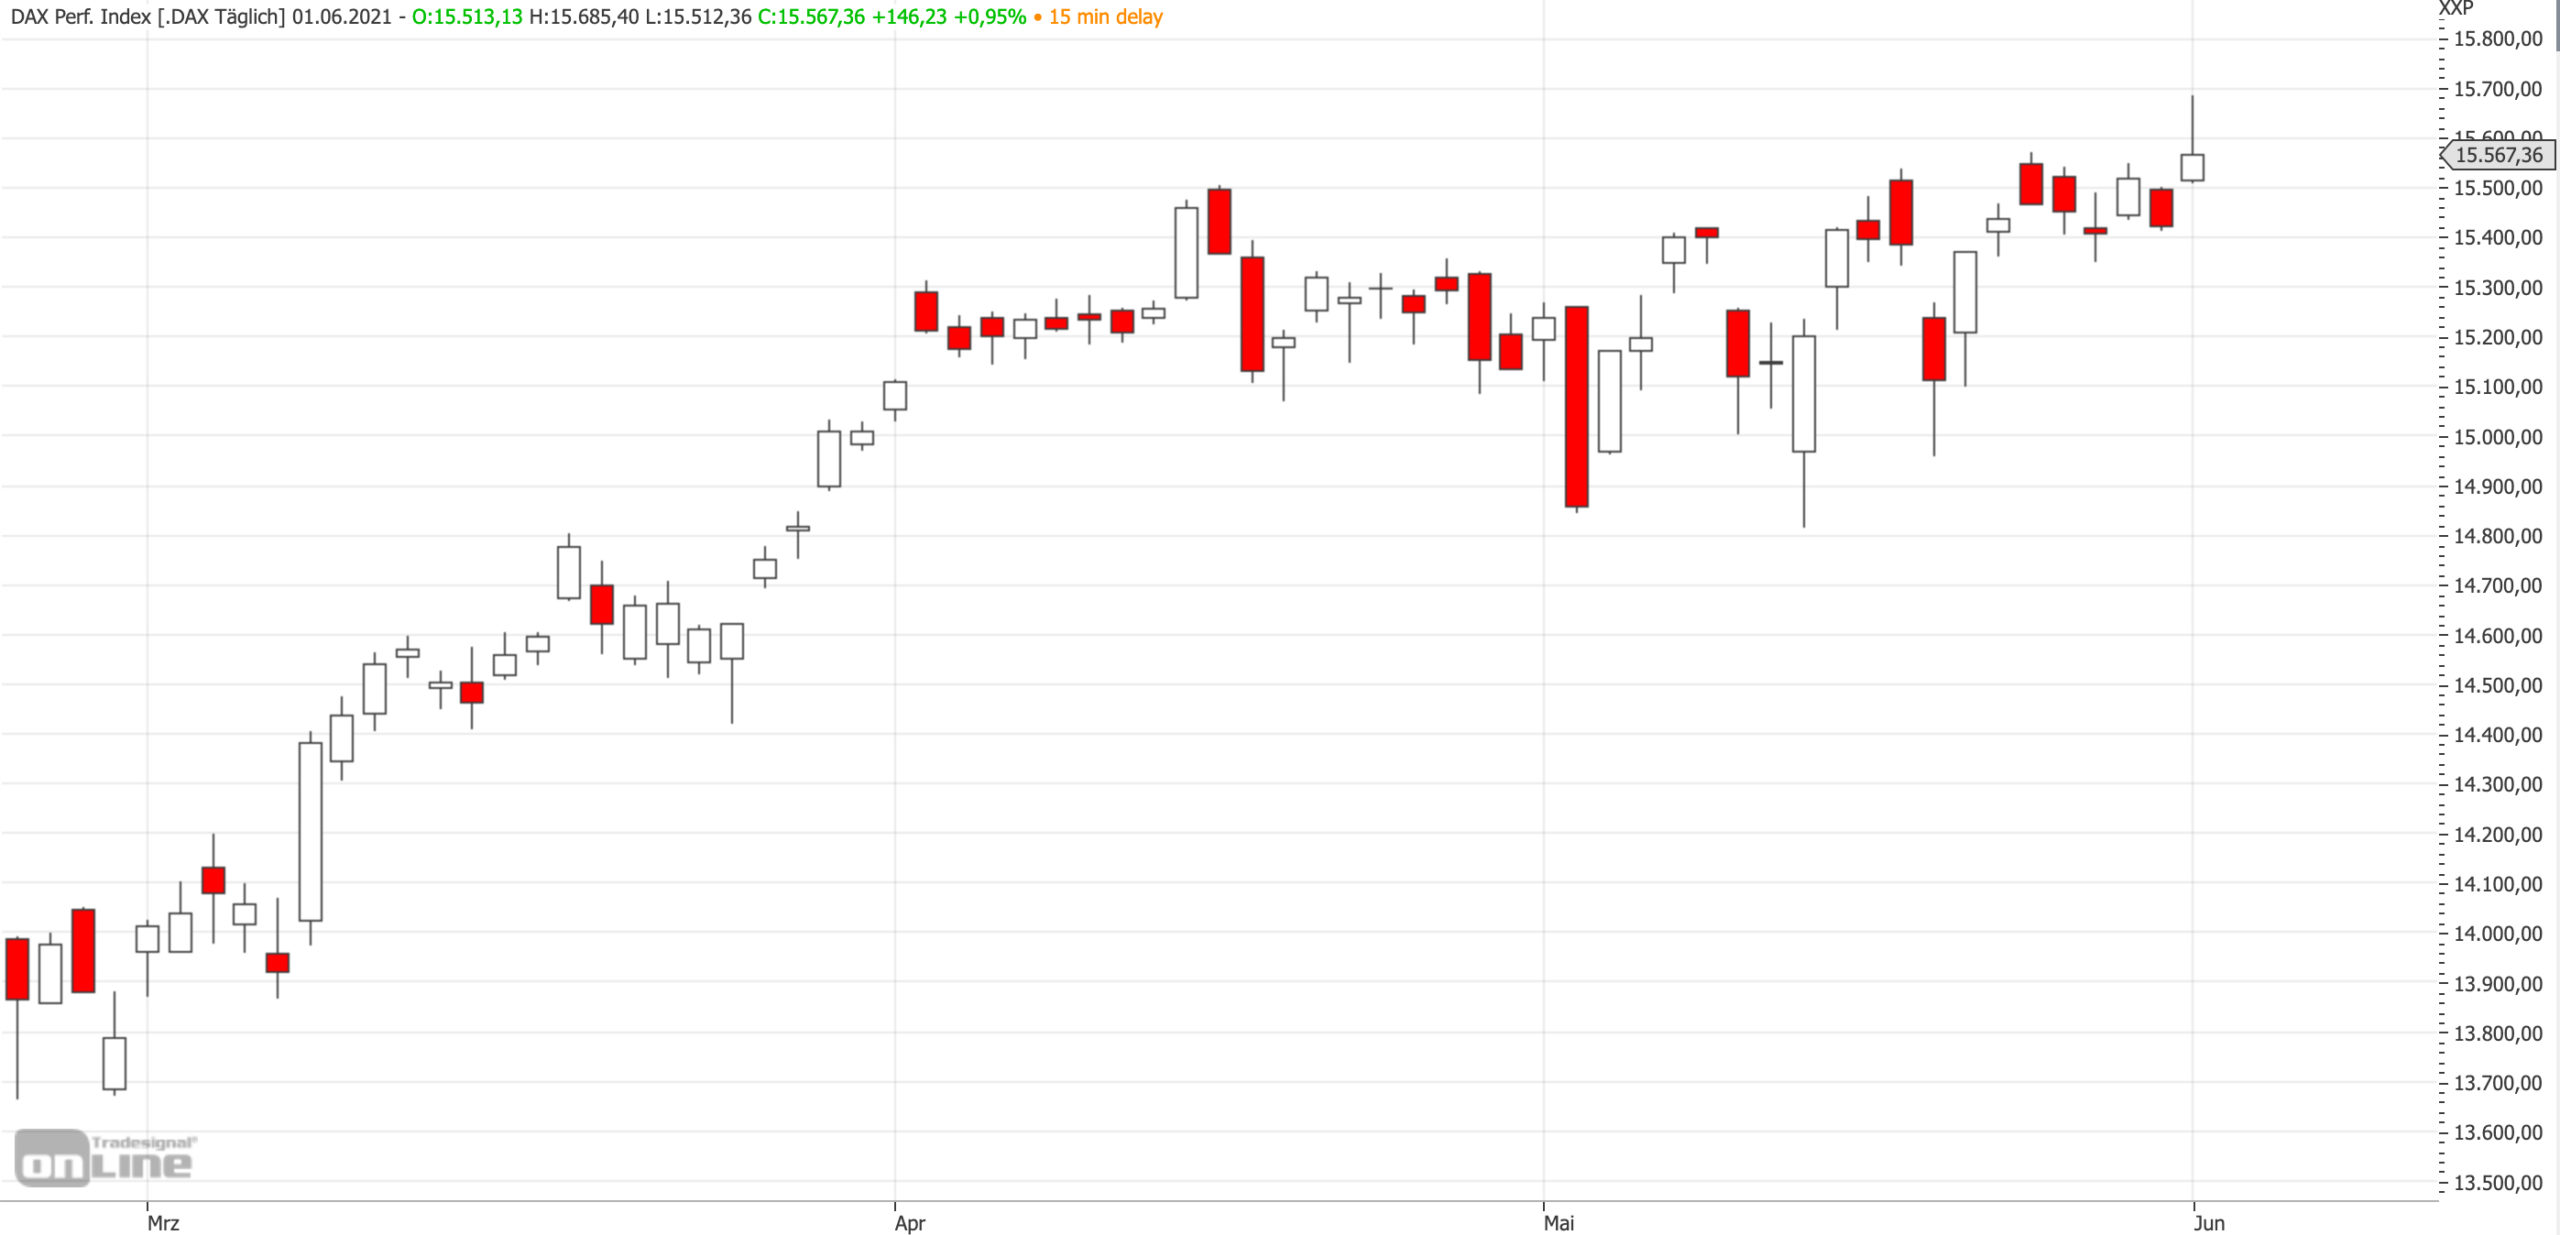 Mittelfristiger DAX-Chart am 01.06.2021